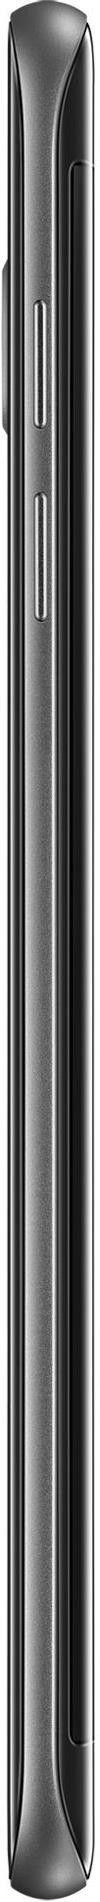 Мобильный телефон Samsung Galaxy S7 Edge Duos G935 (SM-G935FZKUSEK) Black - 2